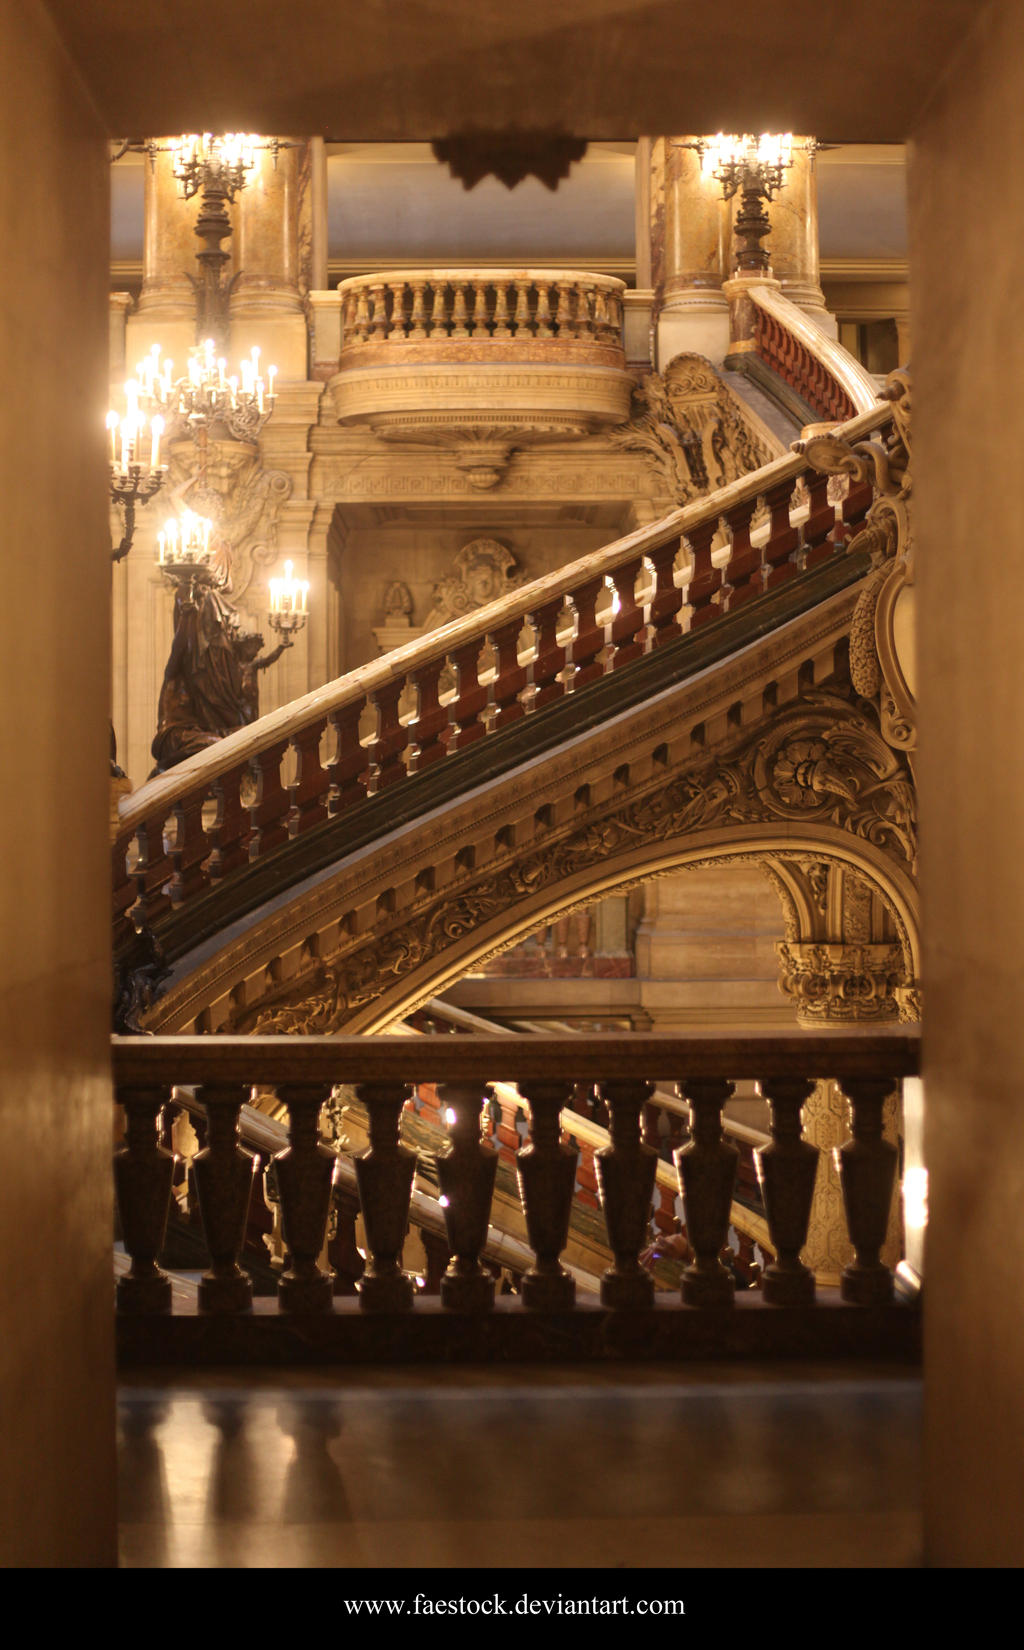 Paris Opera House2 by faestock